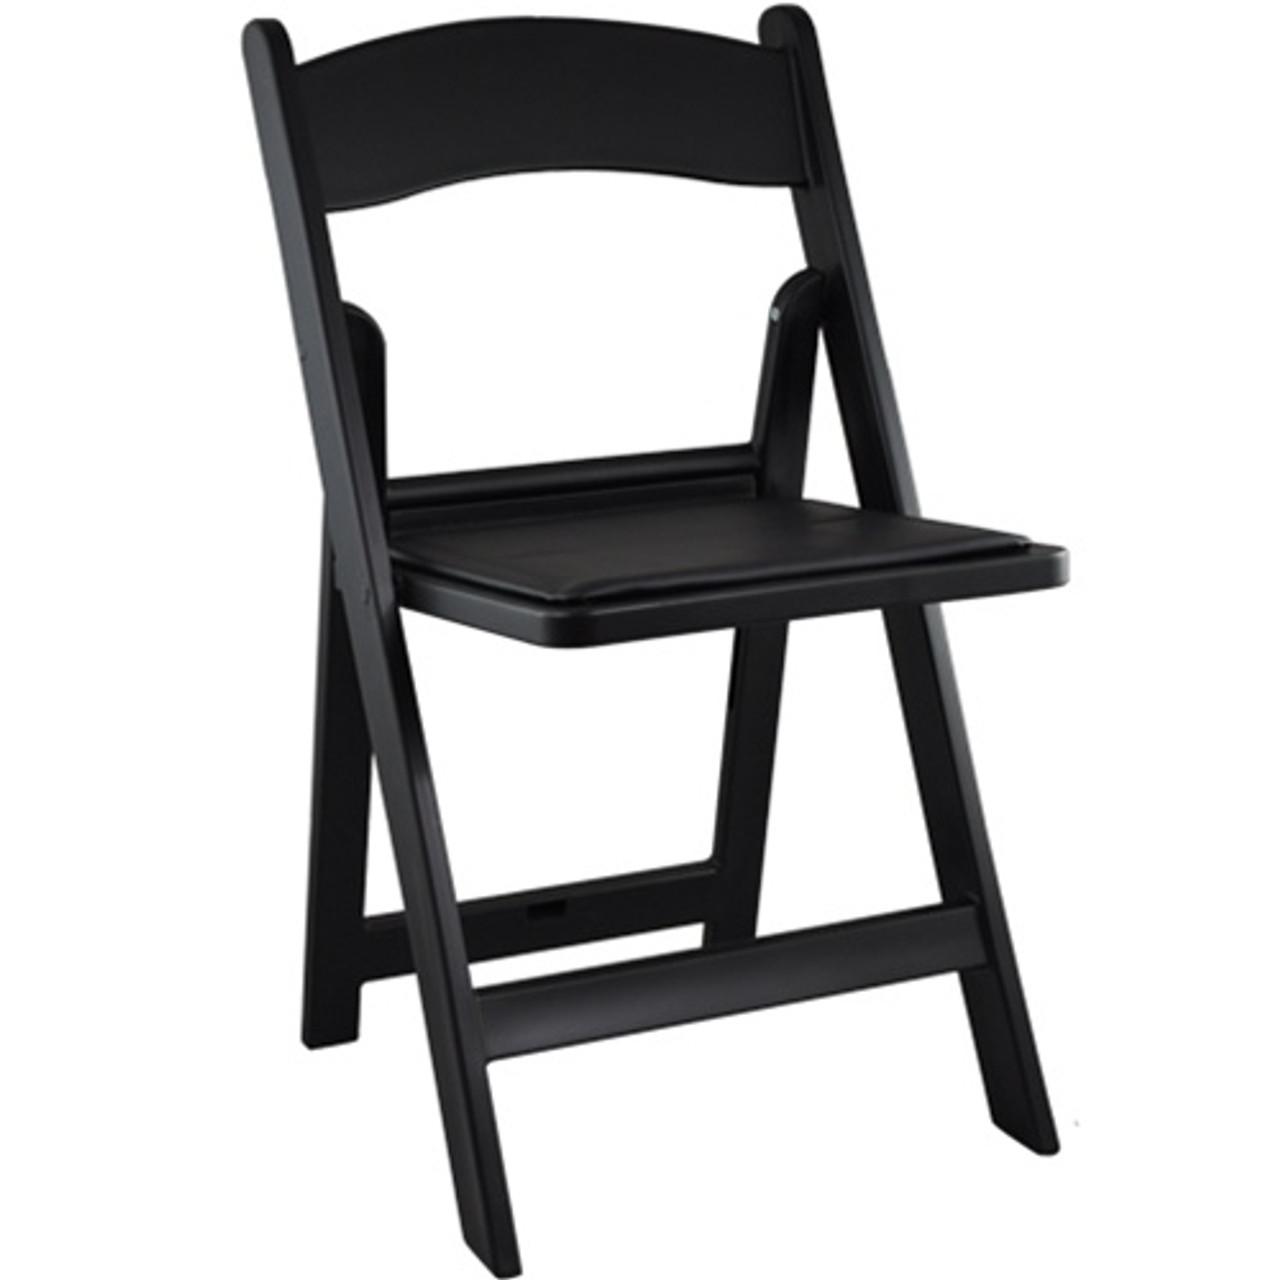 Peachy Advantage Black Resin Folding Chairs Le L 1 Black Gg Bralicious Painted Fabric Chair Ideas Braliciousco